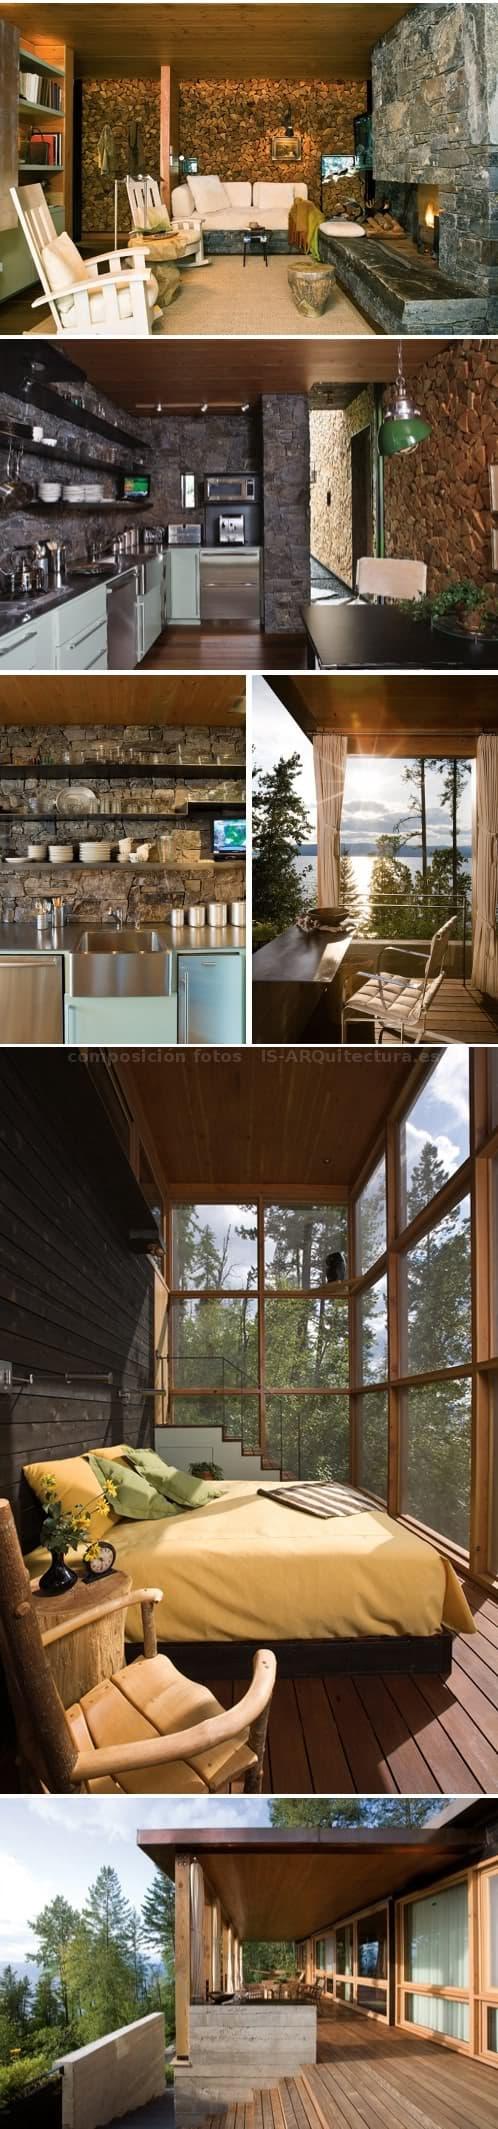 casa-refugio-lago_flathead-fotos del interior